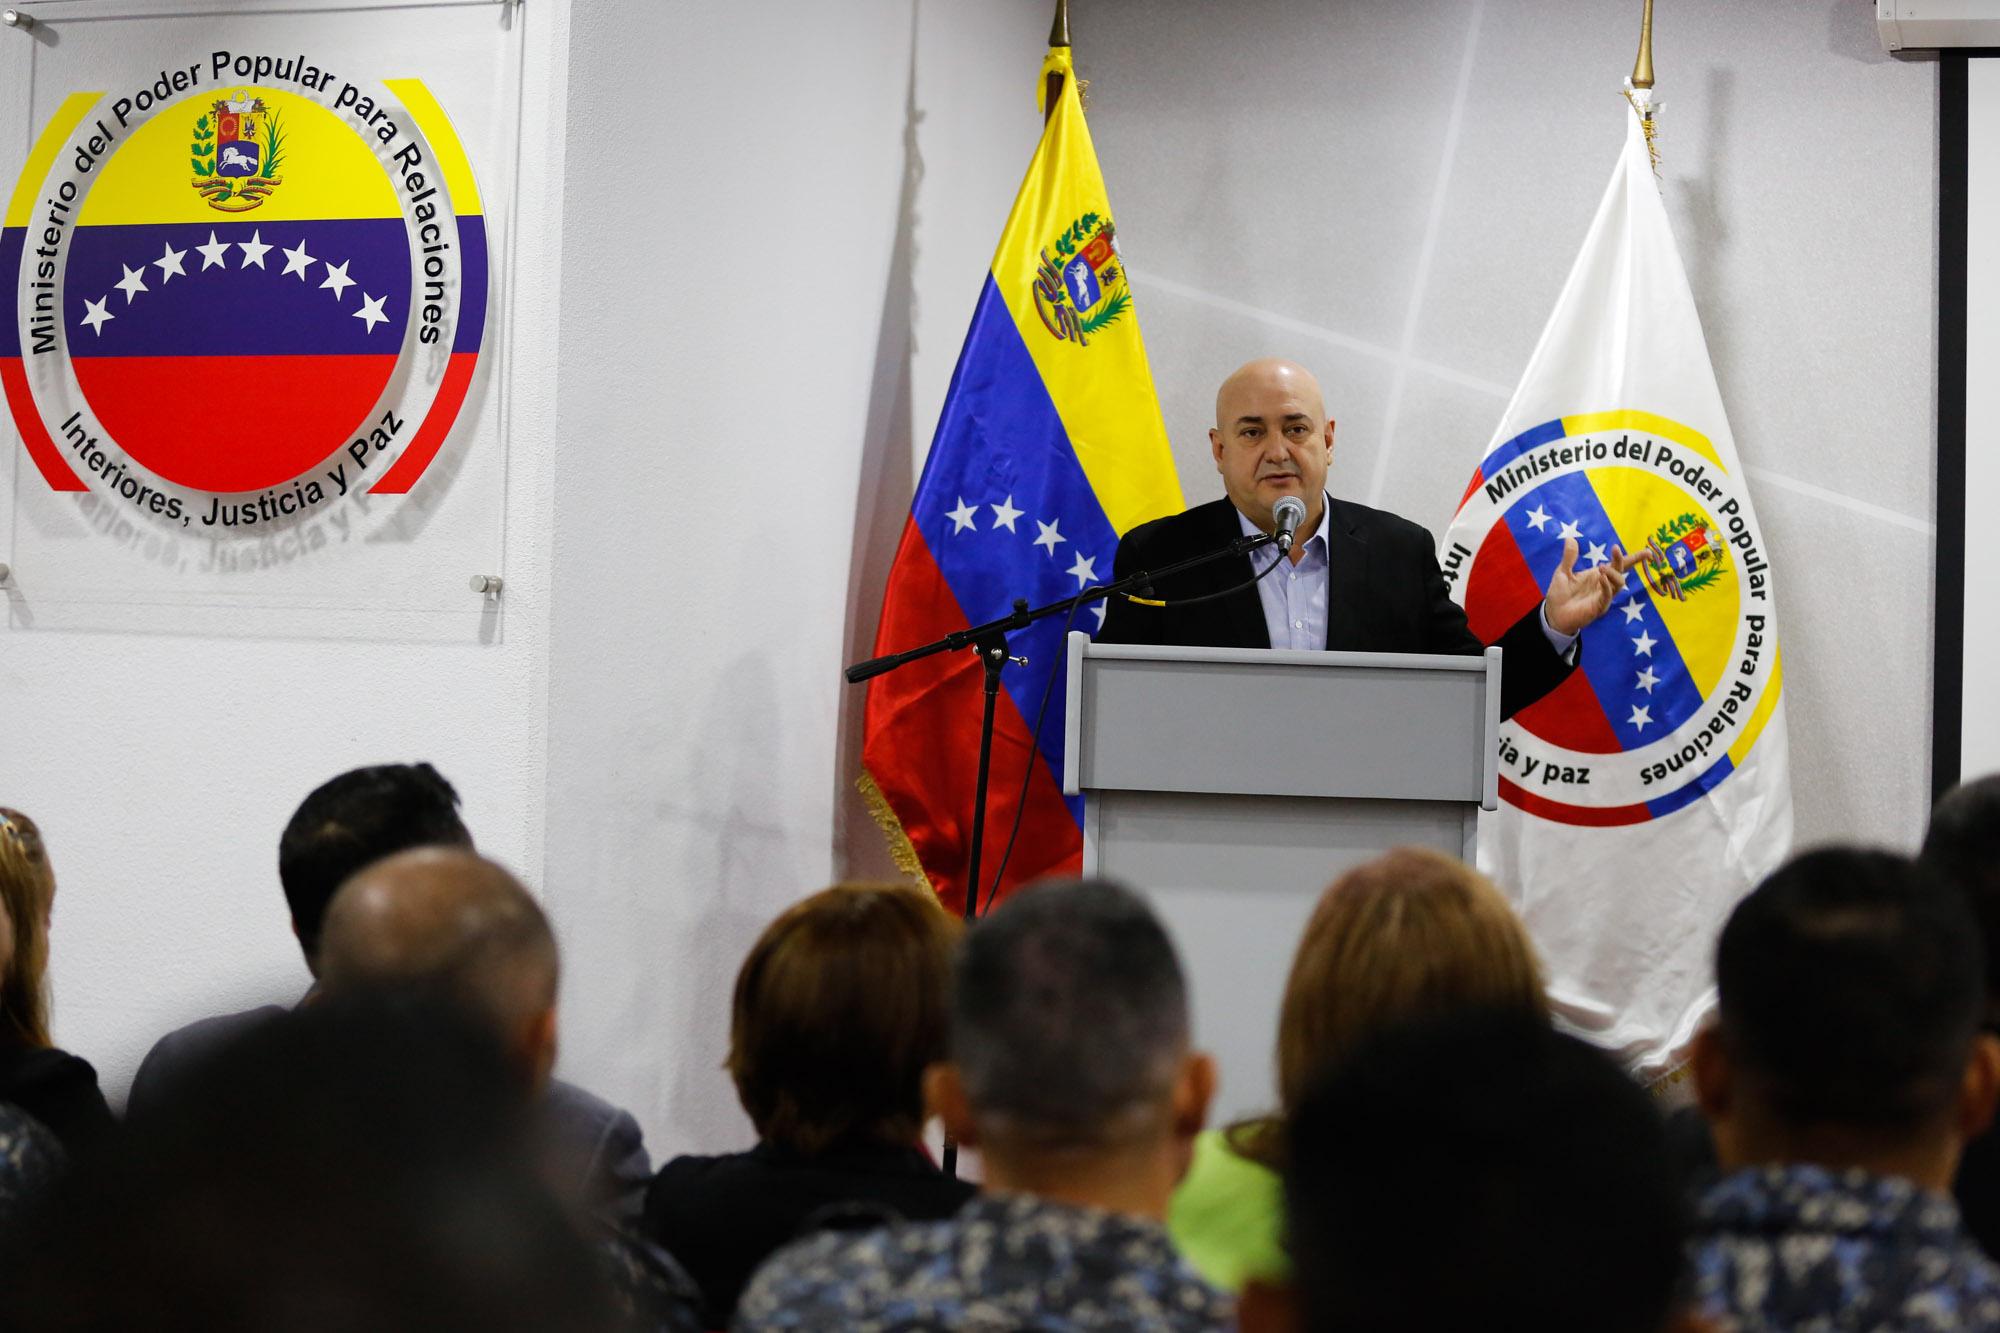 Humberto Ramírez, Viceministro del Sistema Integrado de Investigación Penal (Visiip) (2)